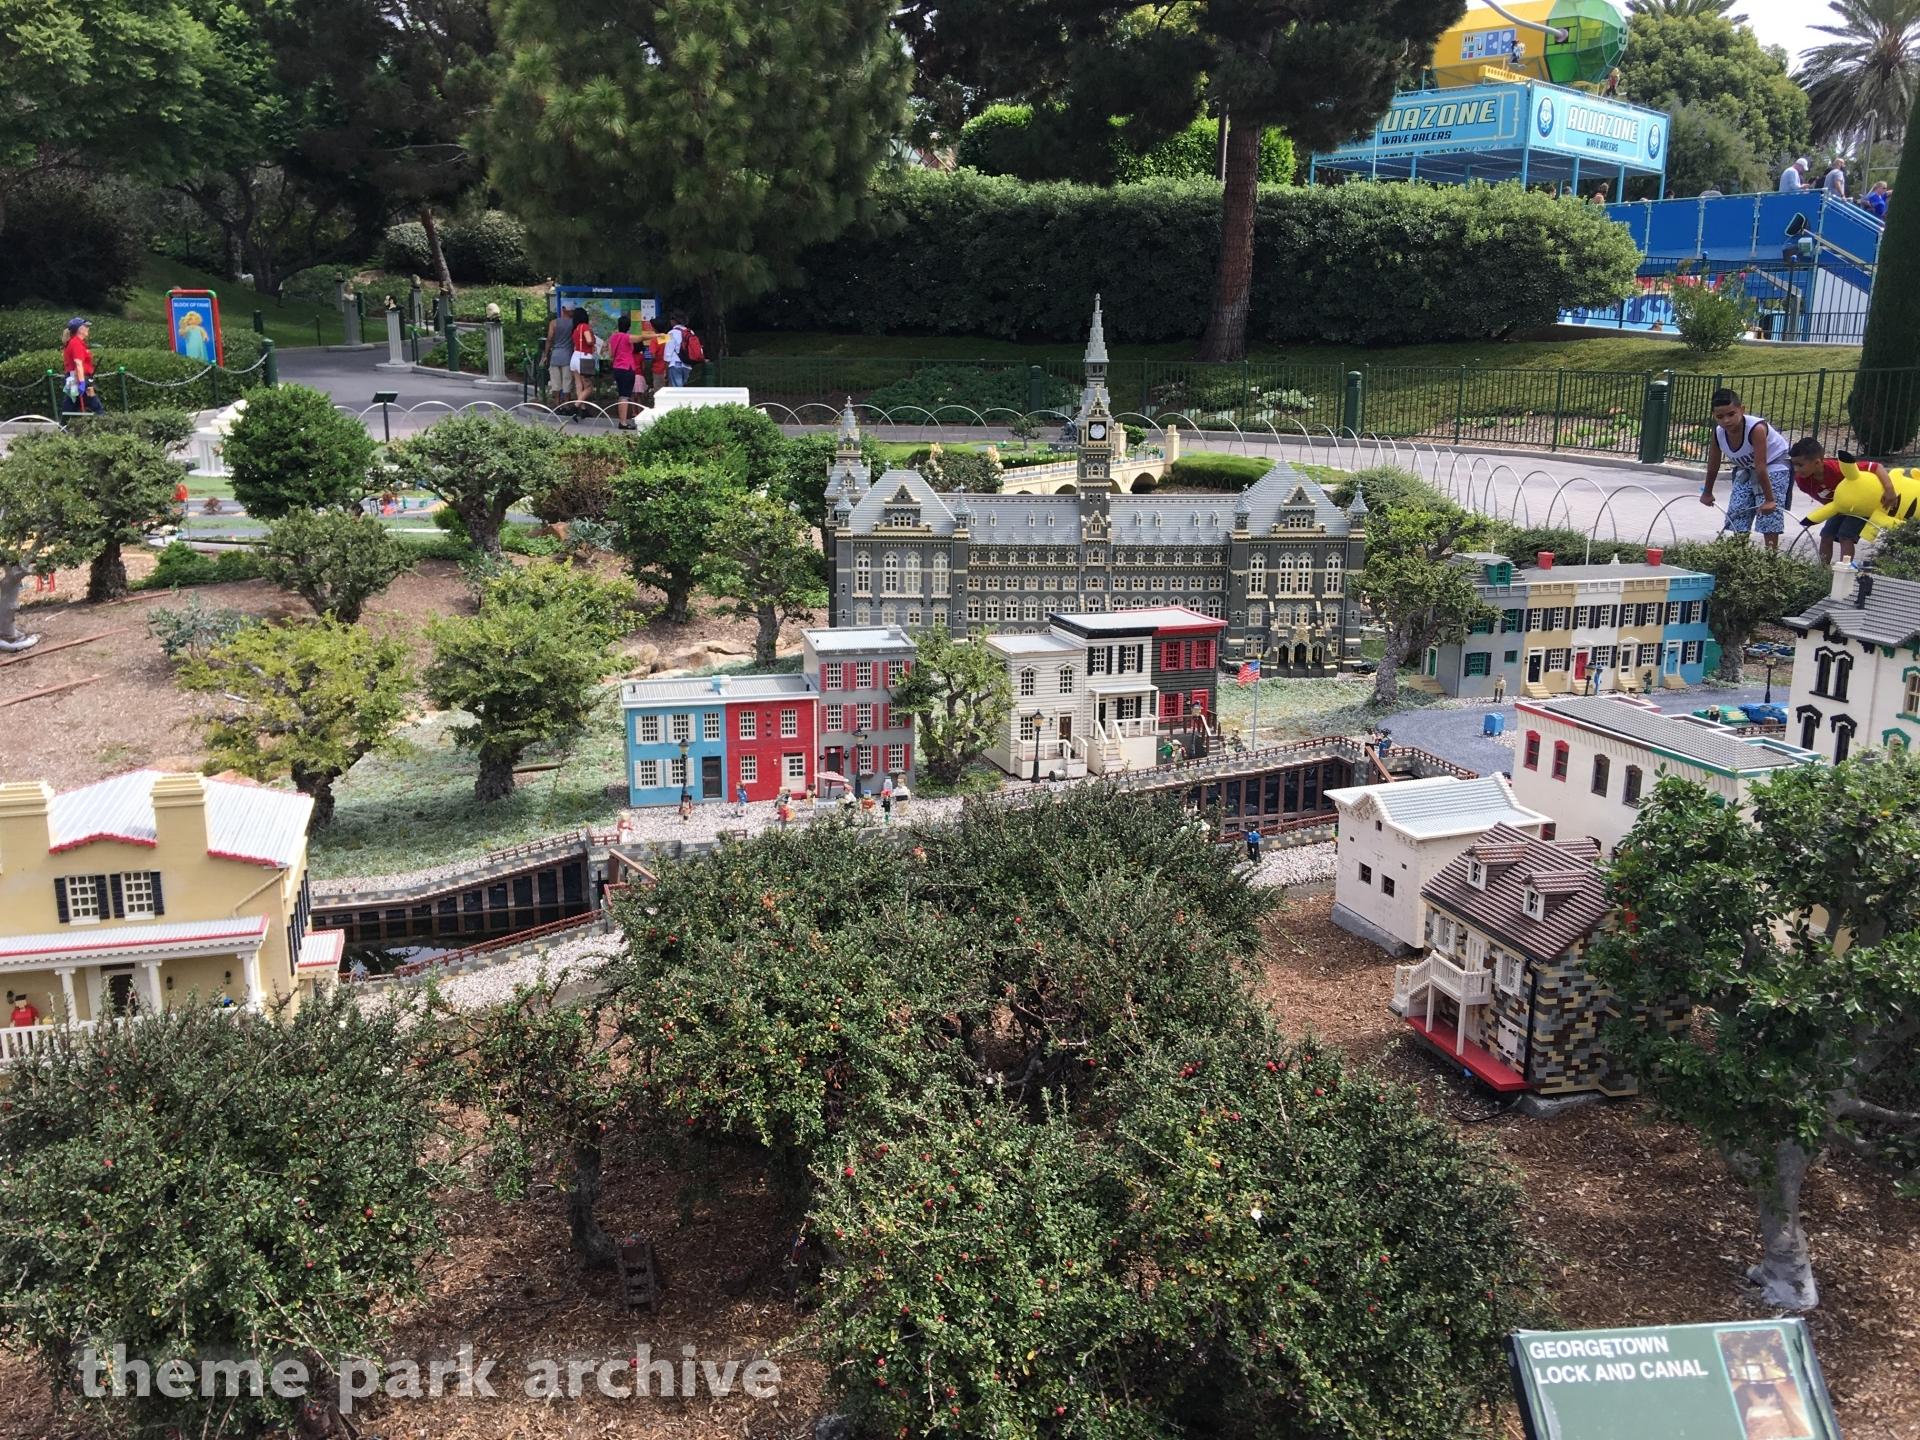 Miniland at LEGOLAND California